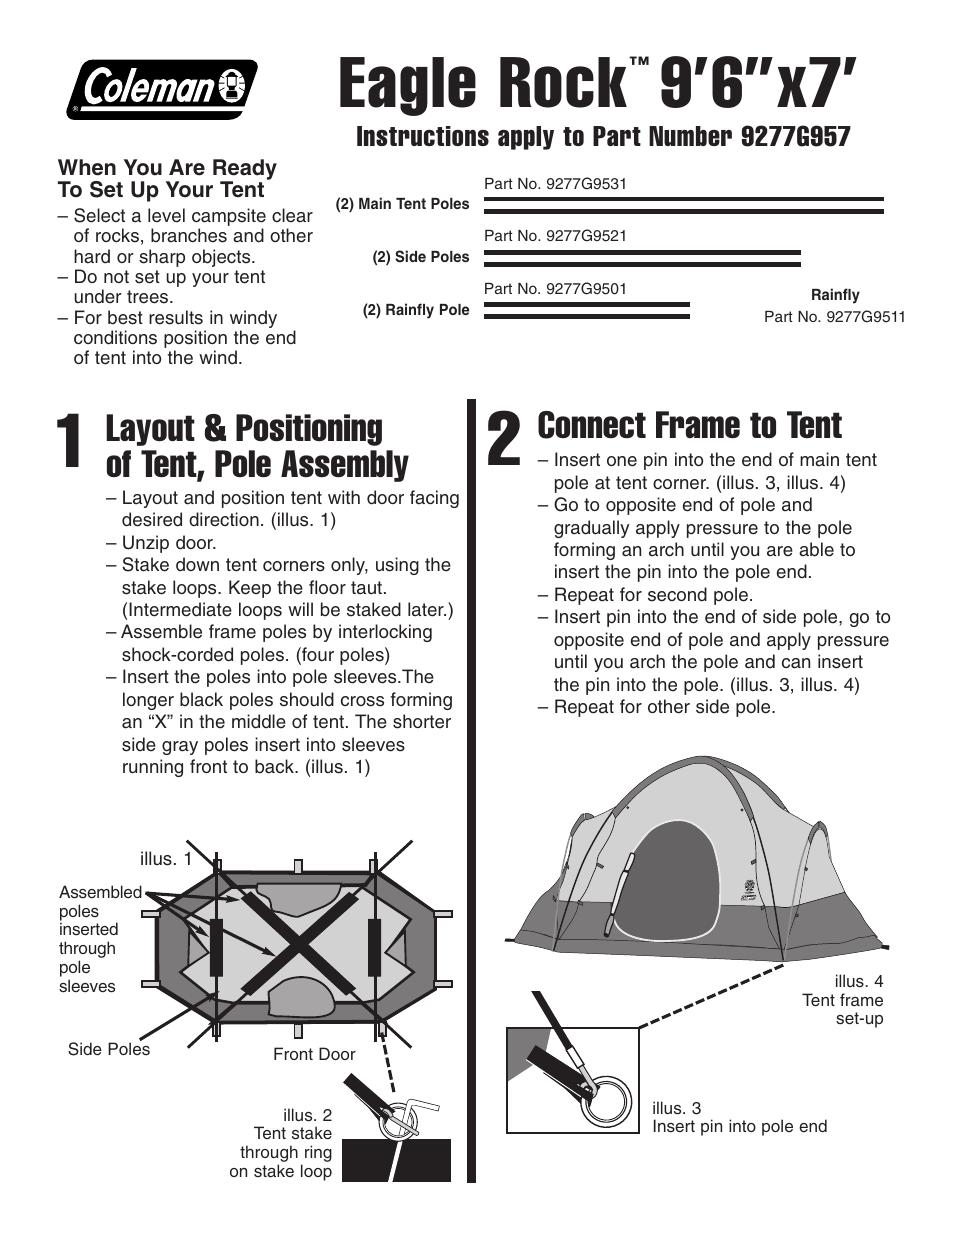 sc 1 st  manualsdir.com & Coleman Eagle Rock User Manual | 2 pages